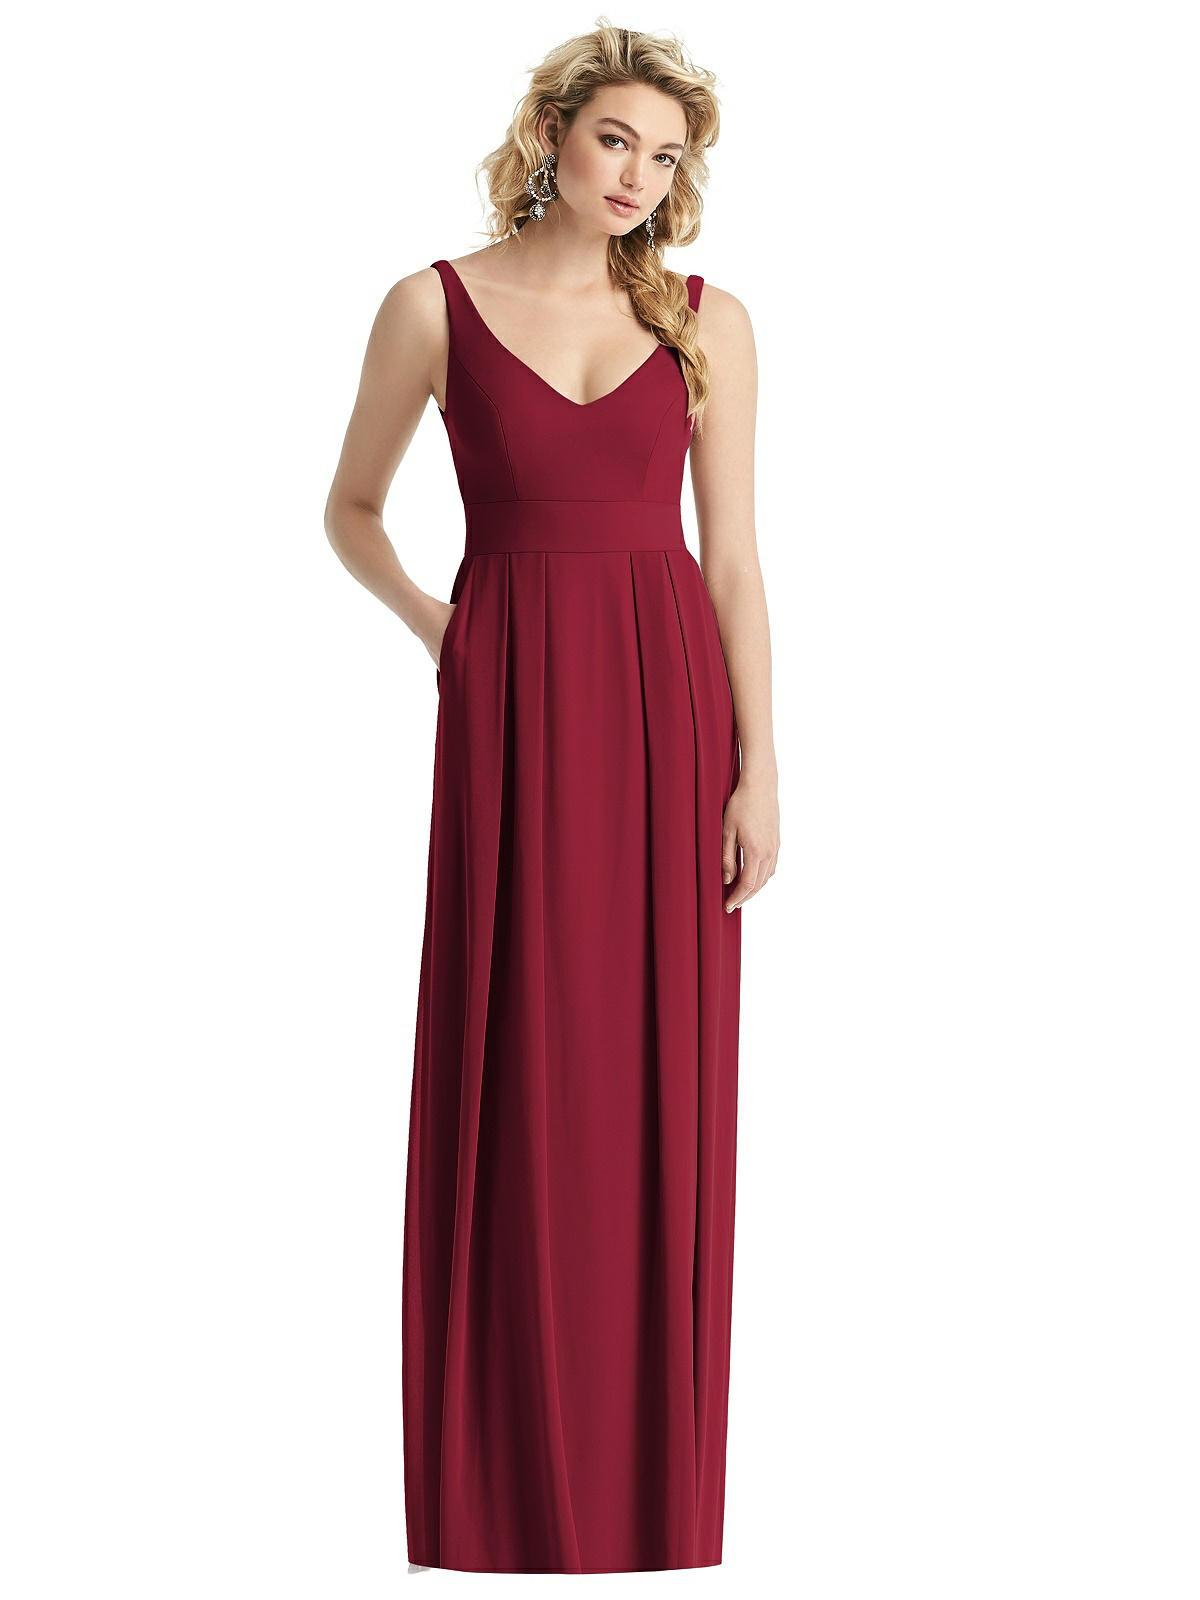 fall wedding bridesmaid dress burgundy